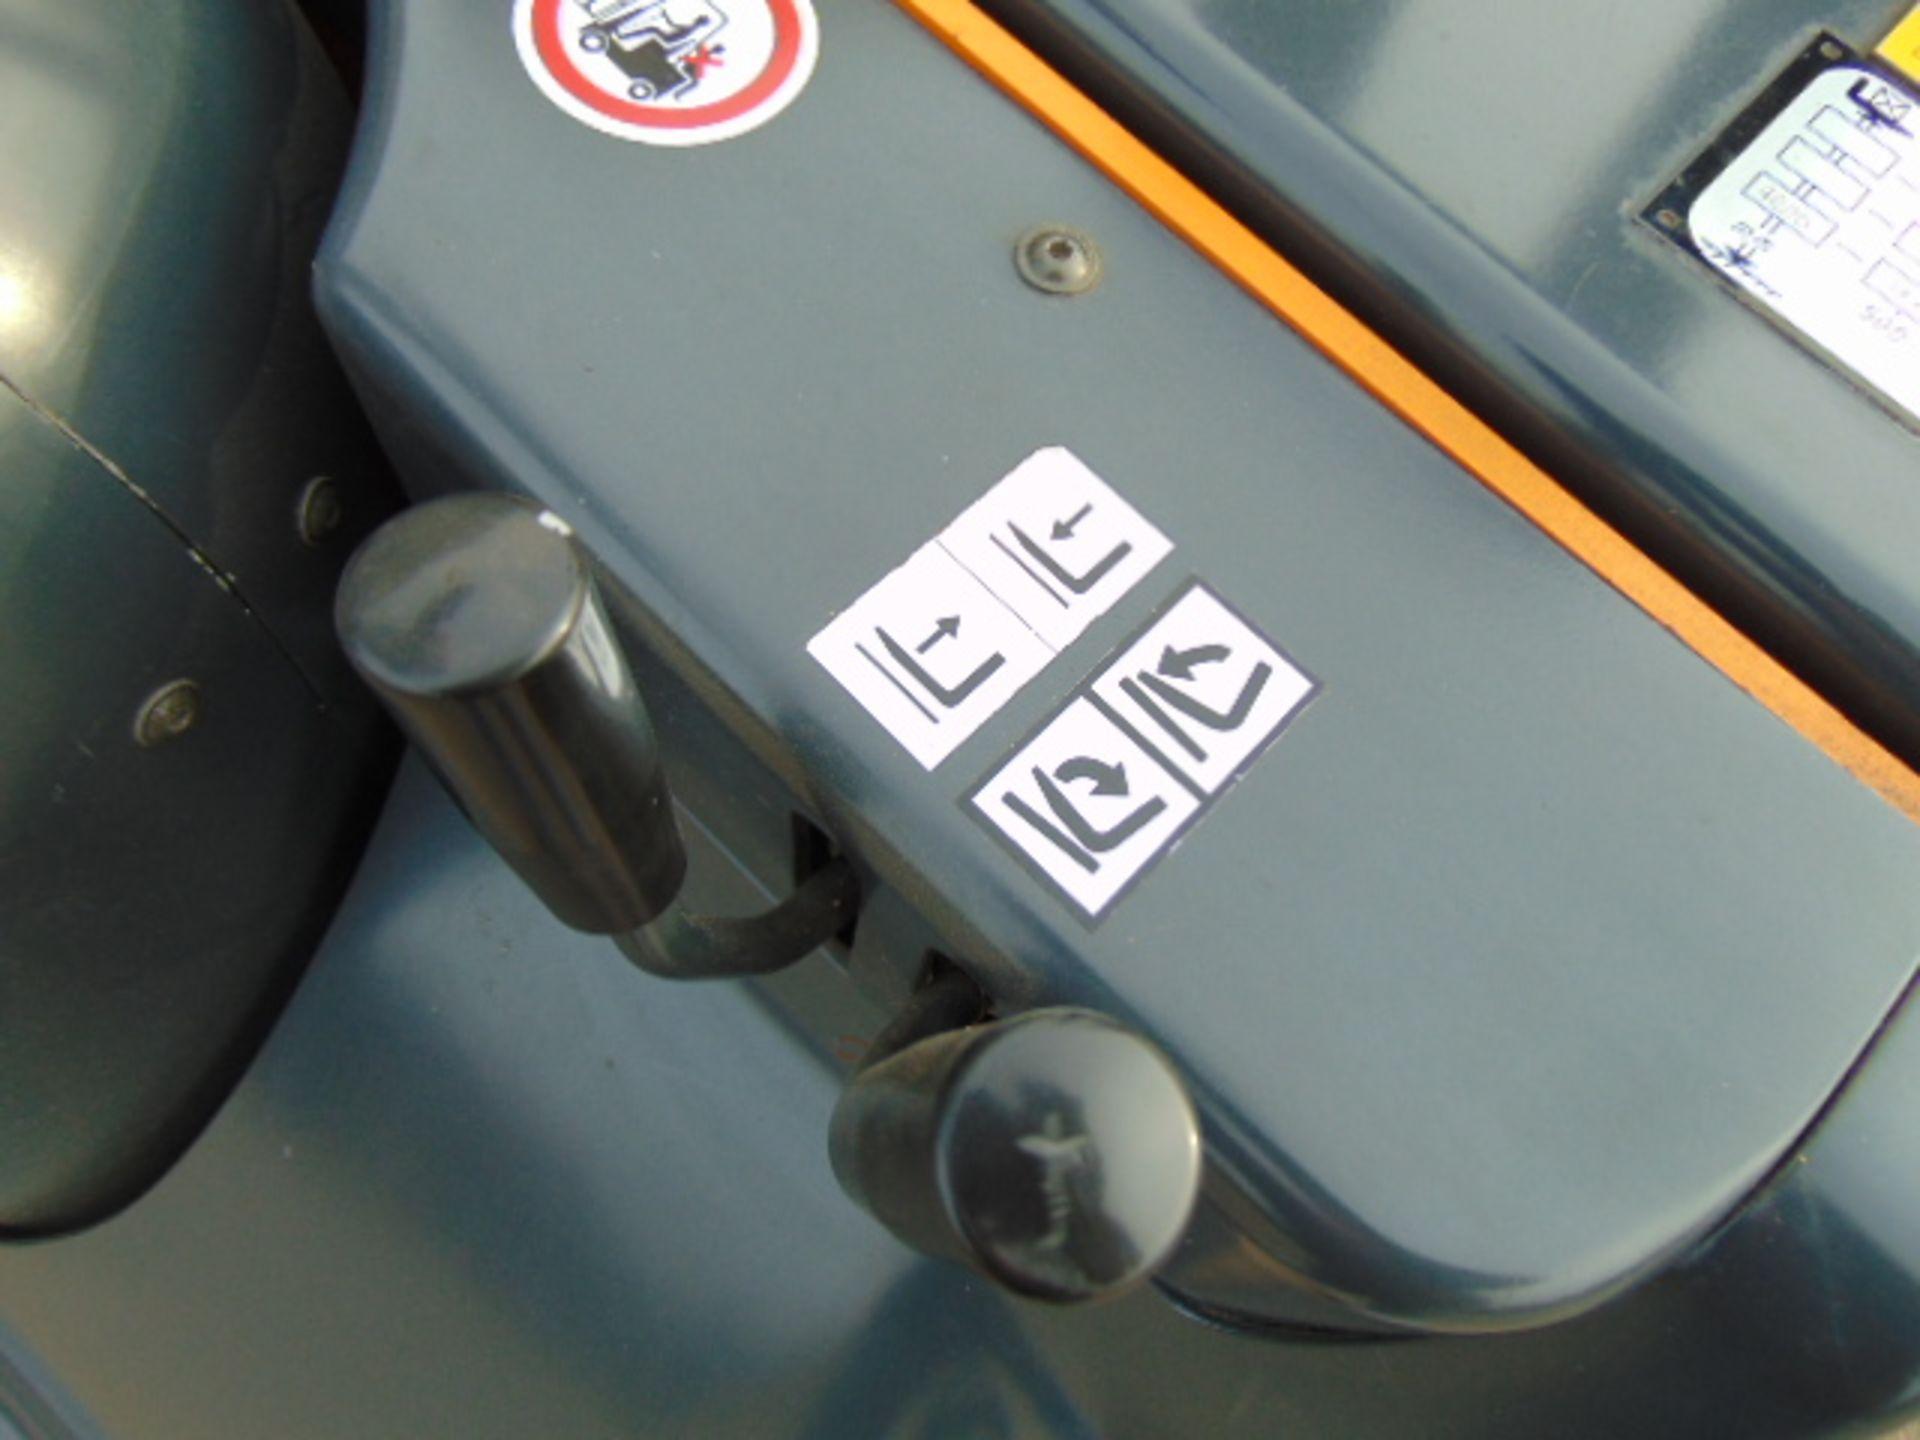 Lot 11 - Still EGG10 Electric Pedestrian Pallet Stacker c/w Charger